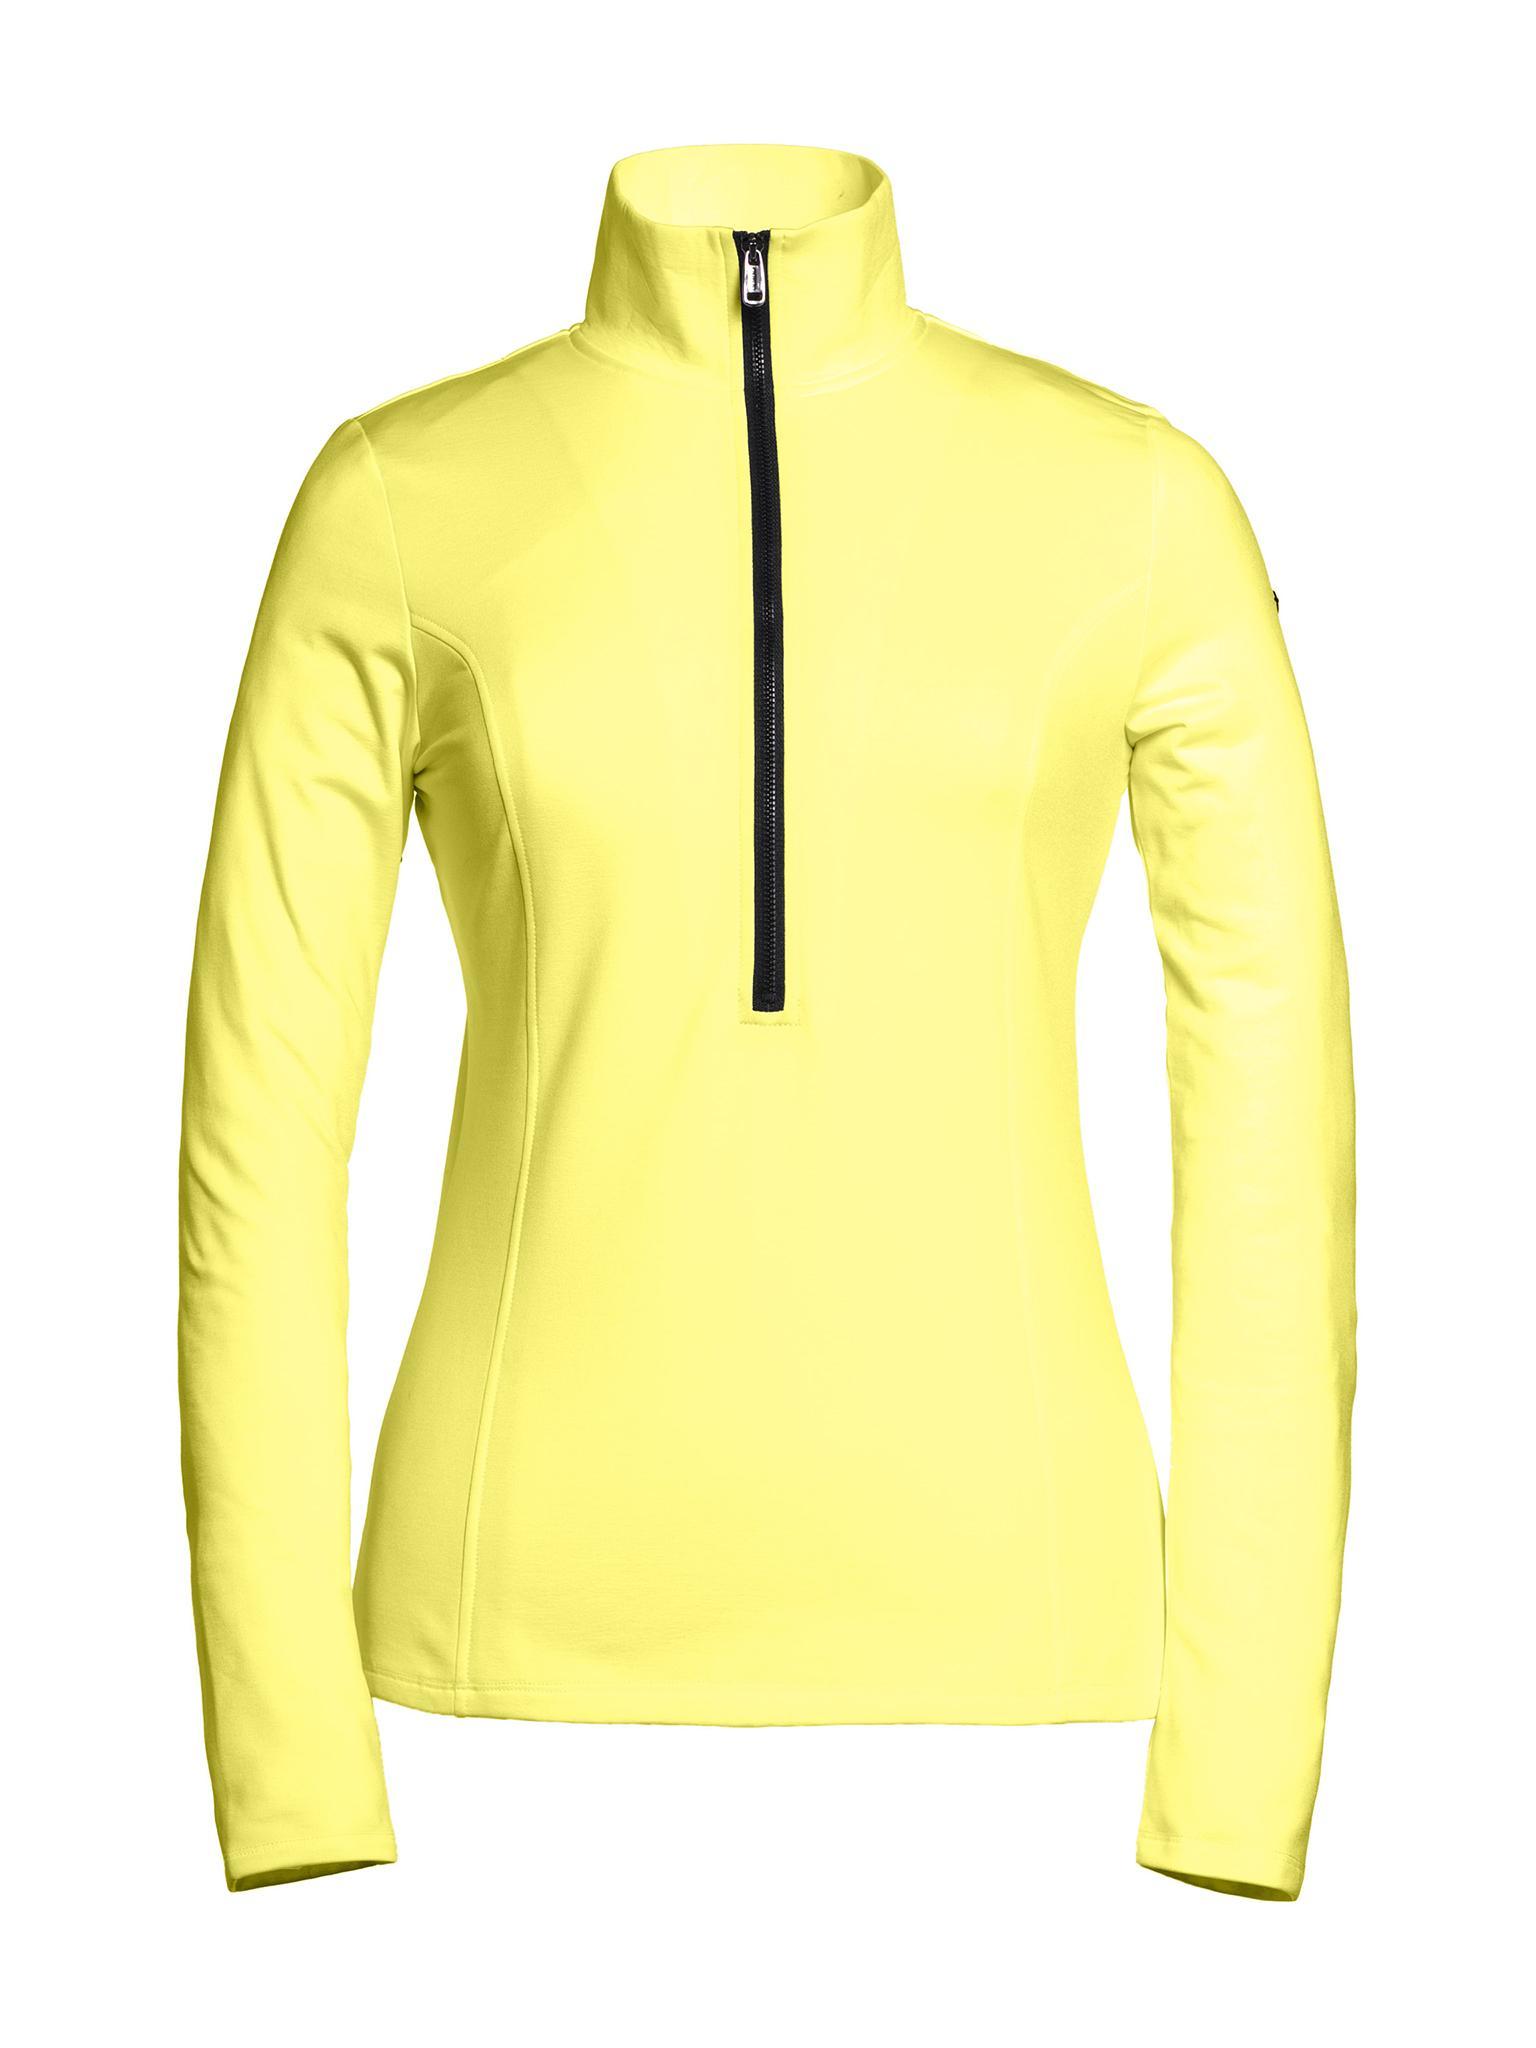 Neon gele dames pully Goldbergh - Serena - GB30-10-193-104